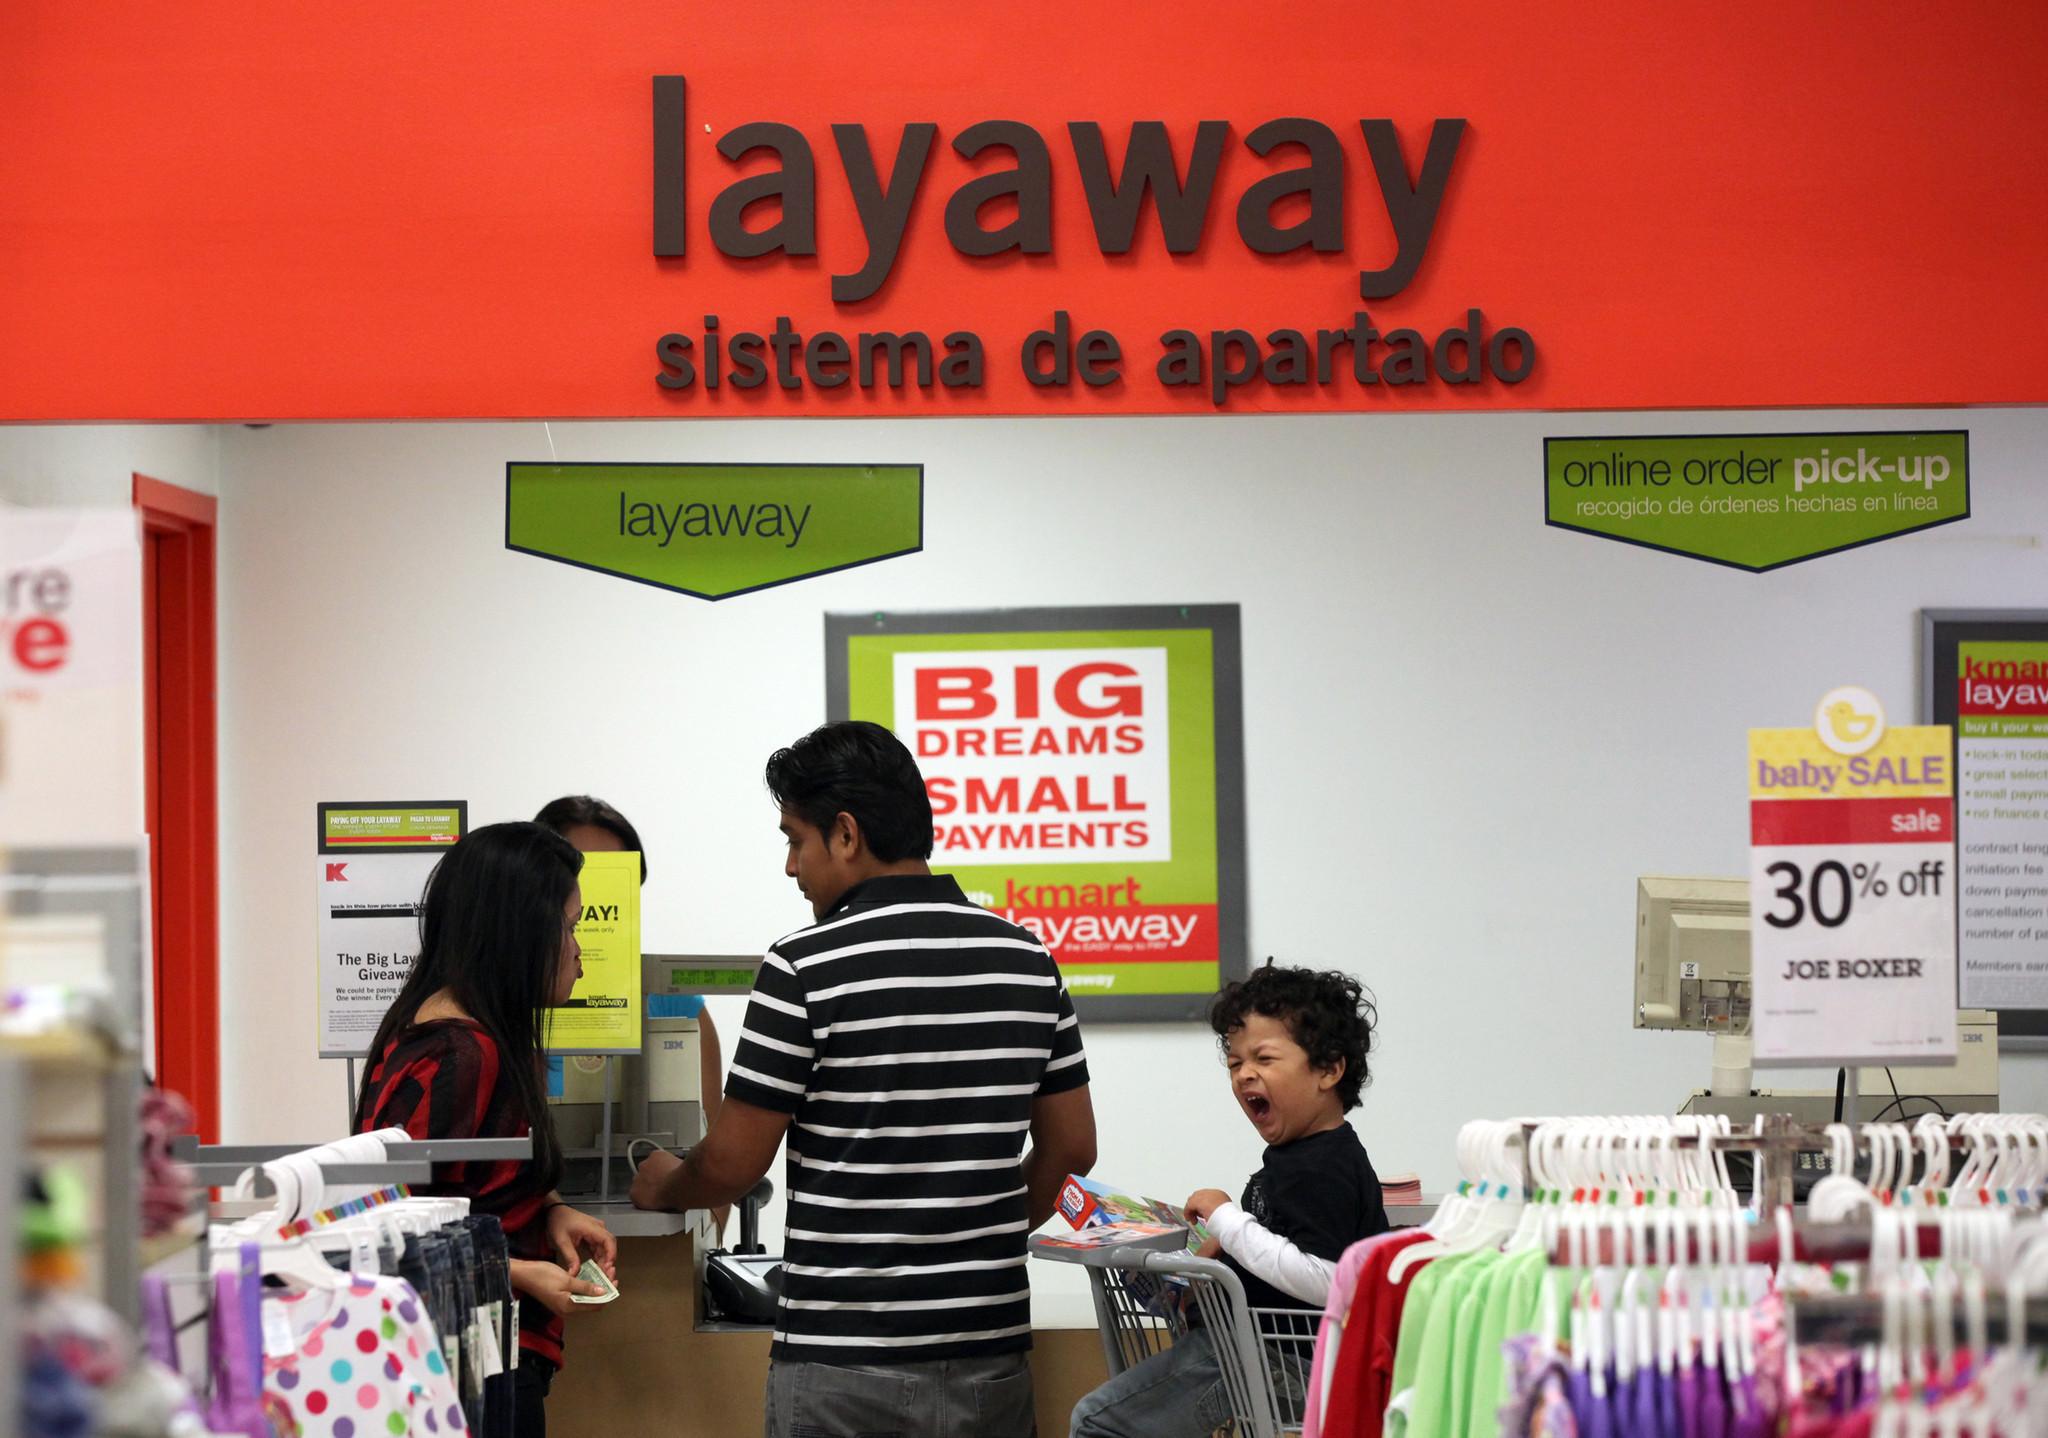 eLayaway has revolutionized the way layaway works